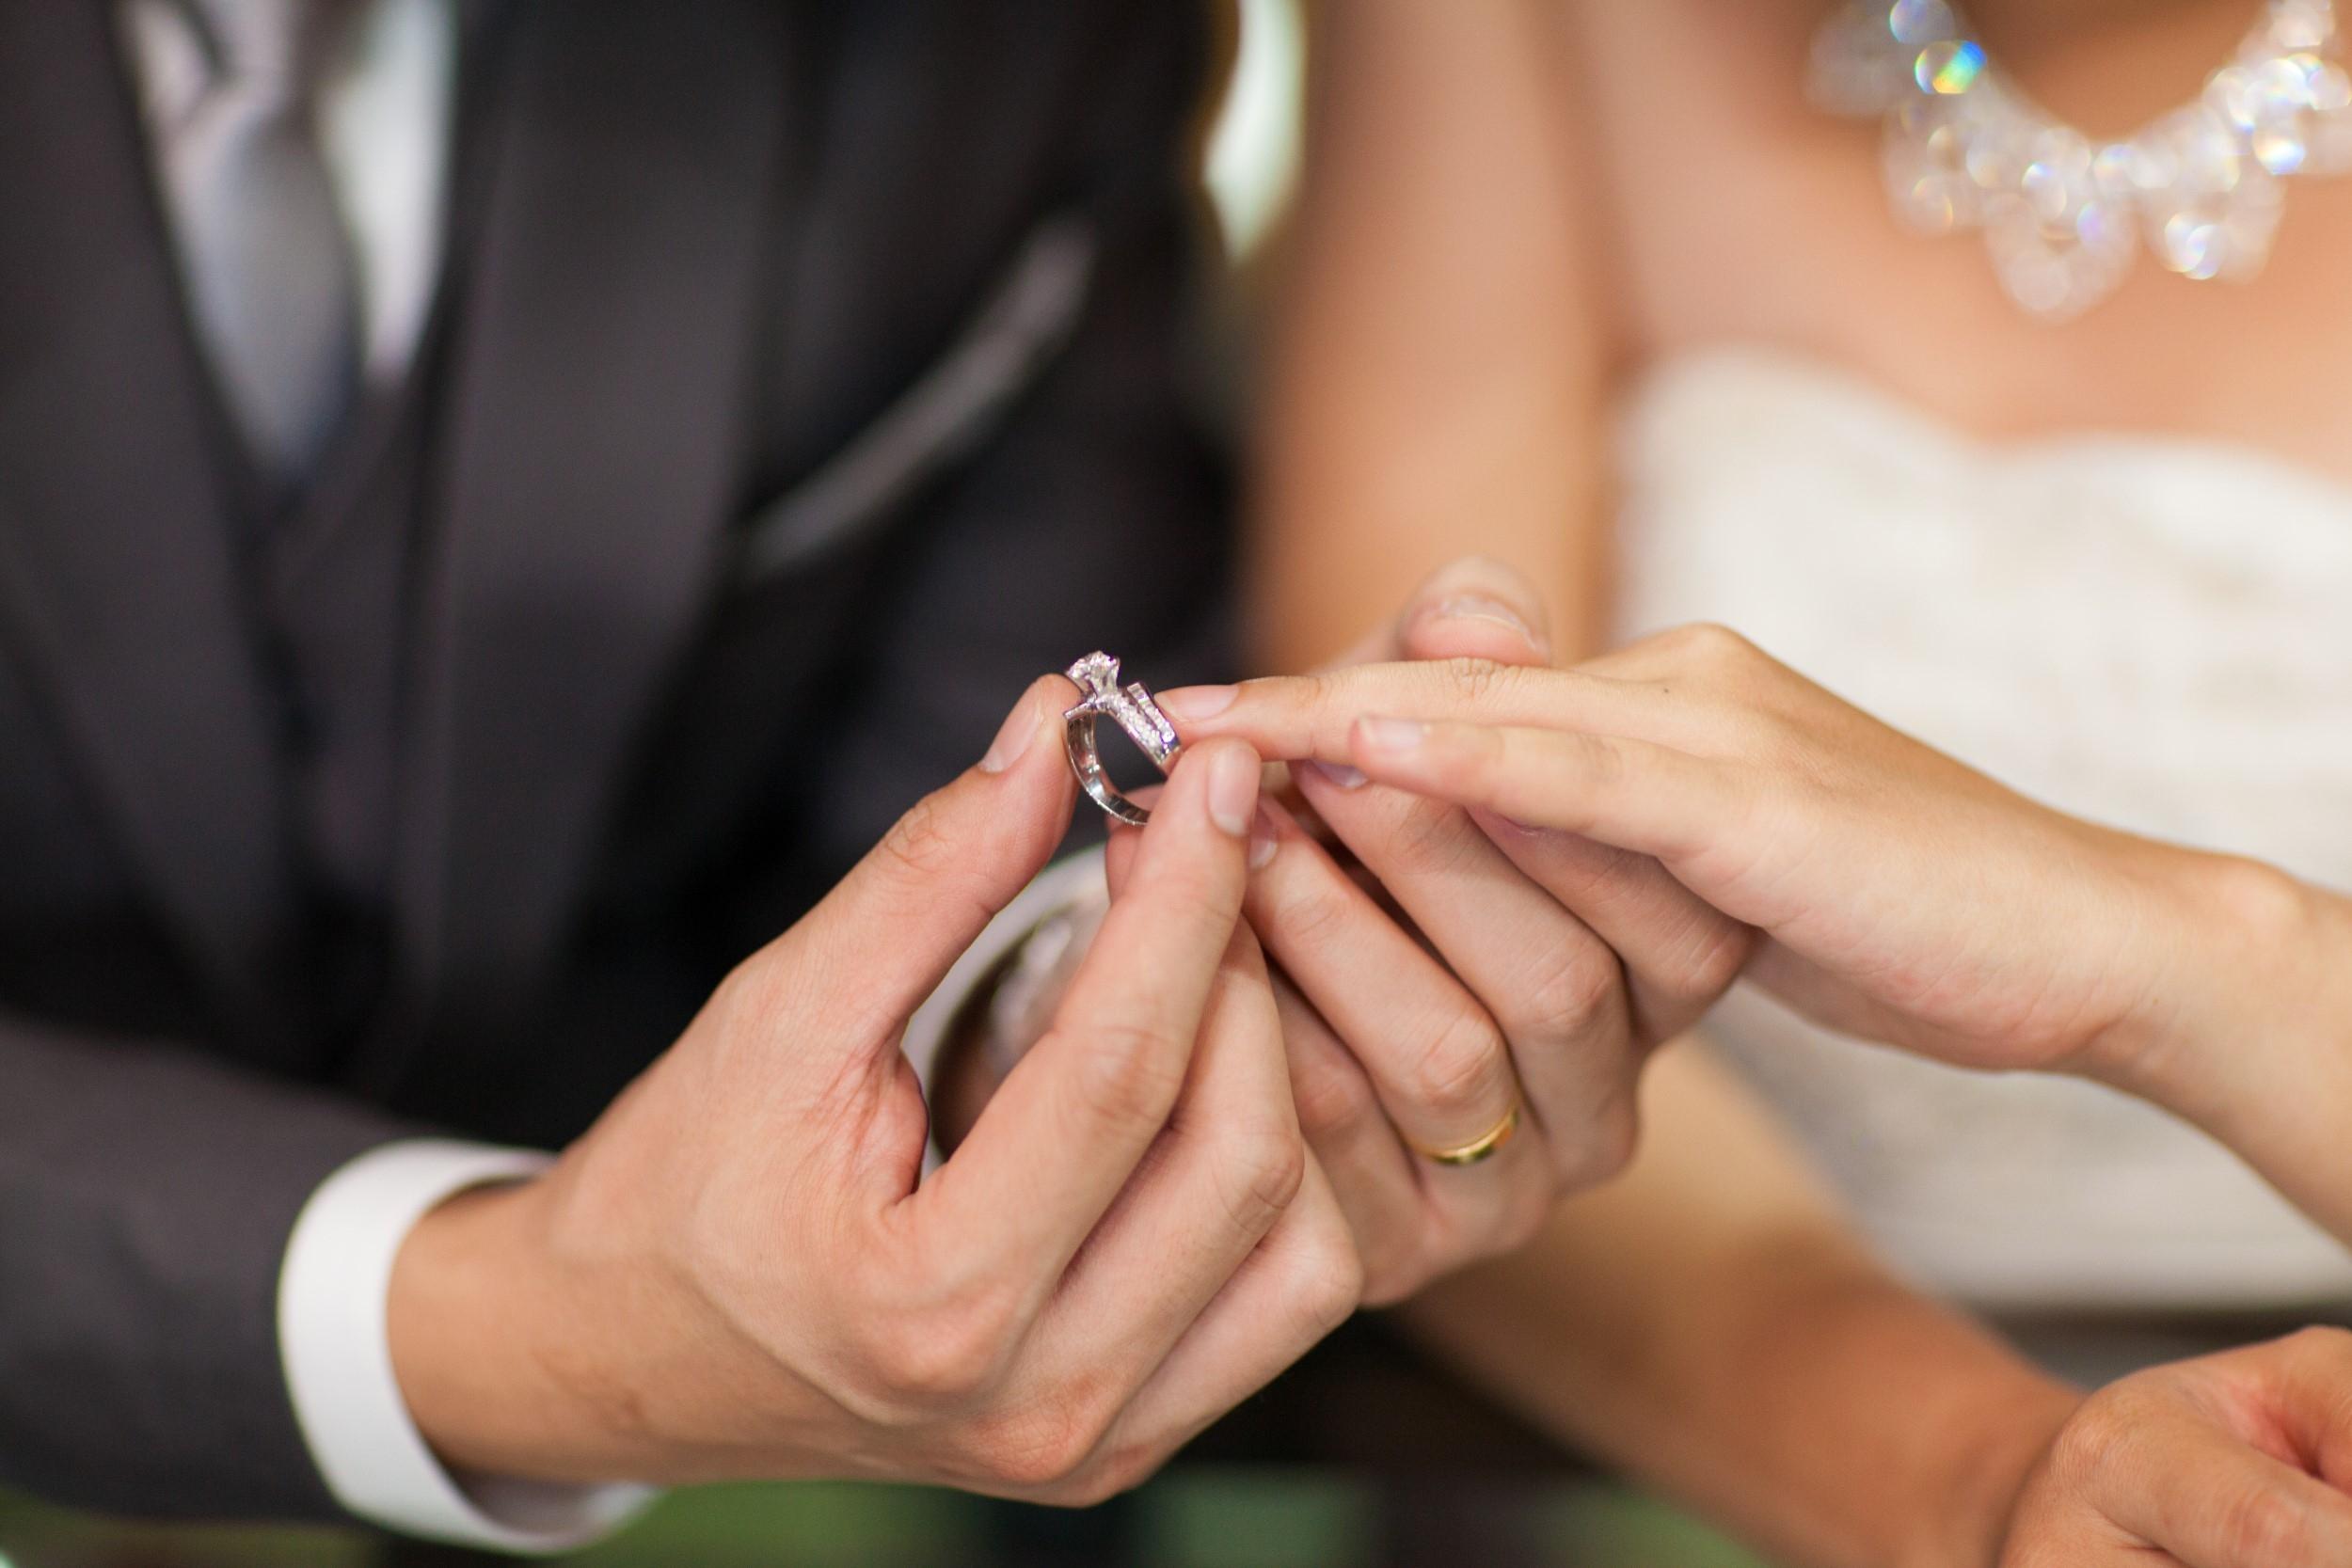 WEDDING MOMENT CLASSIC RING EXCHANGE 004992 (Custom)